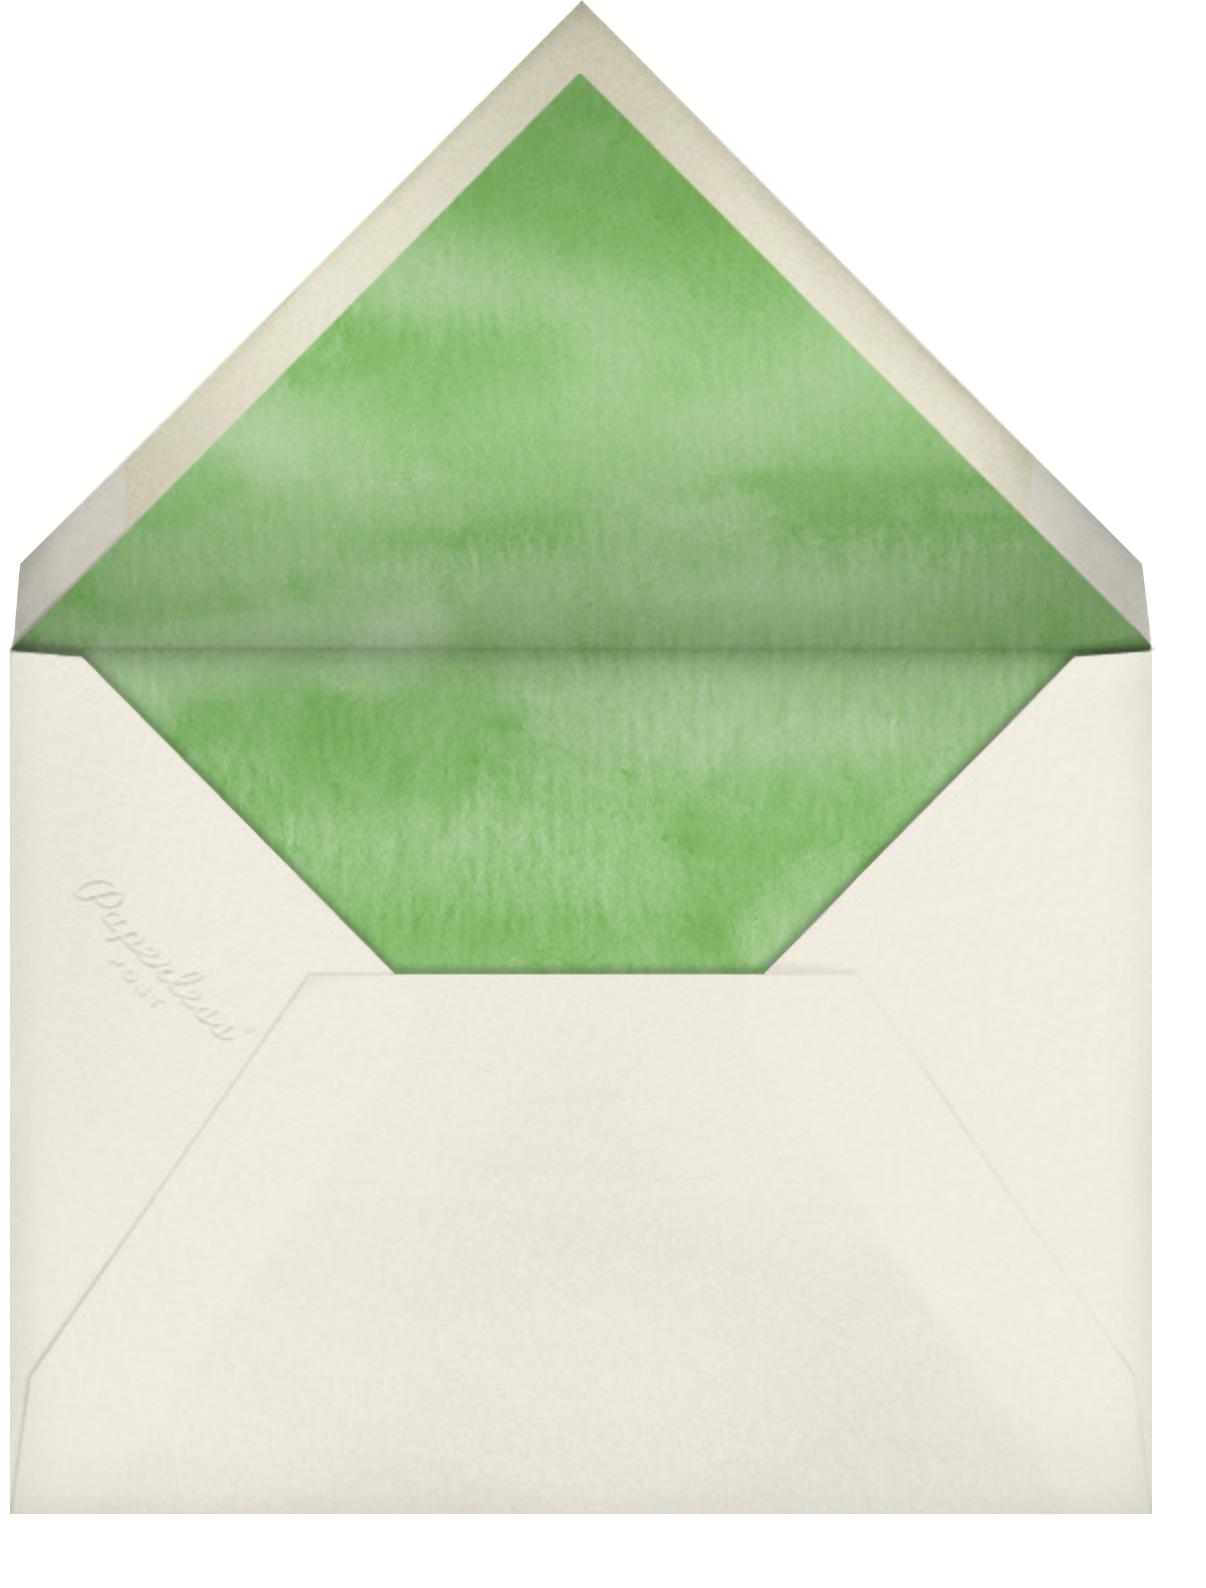 Fresh Cut - Felix Doolittle - Mother's Day - envelope back